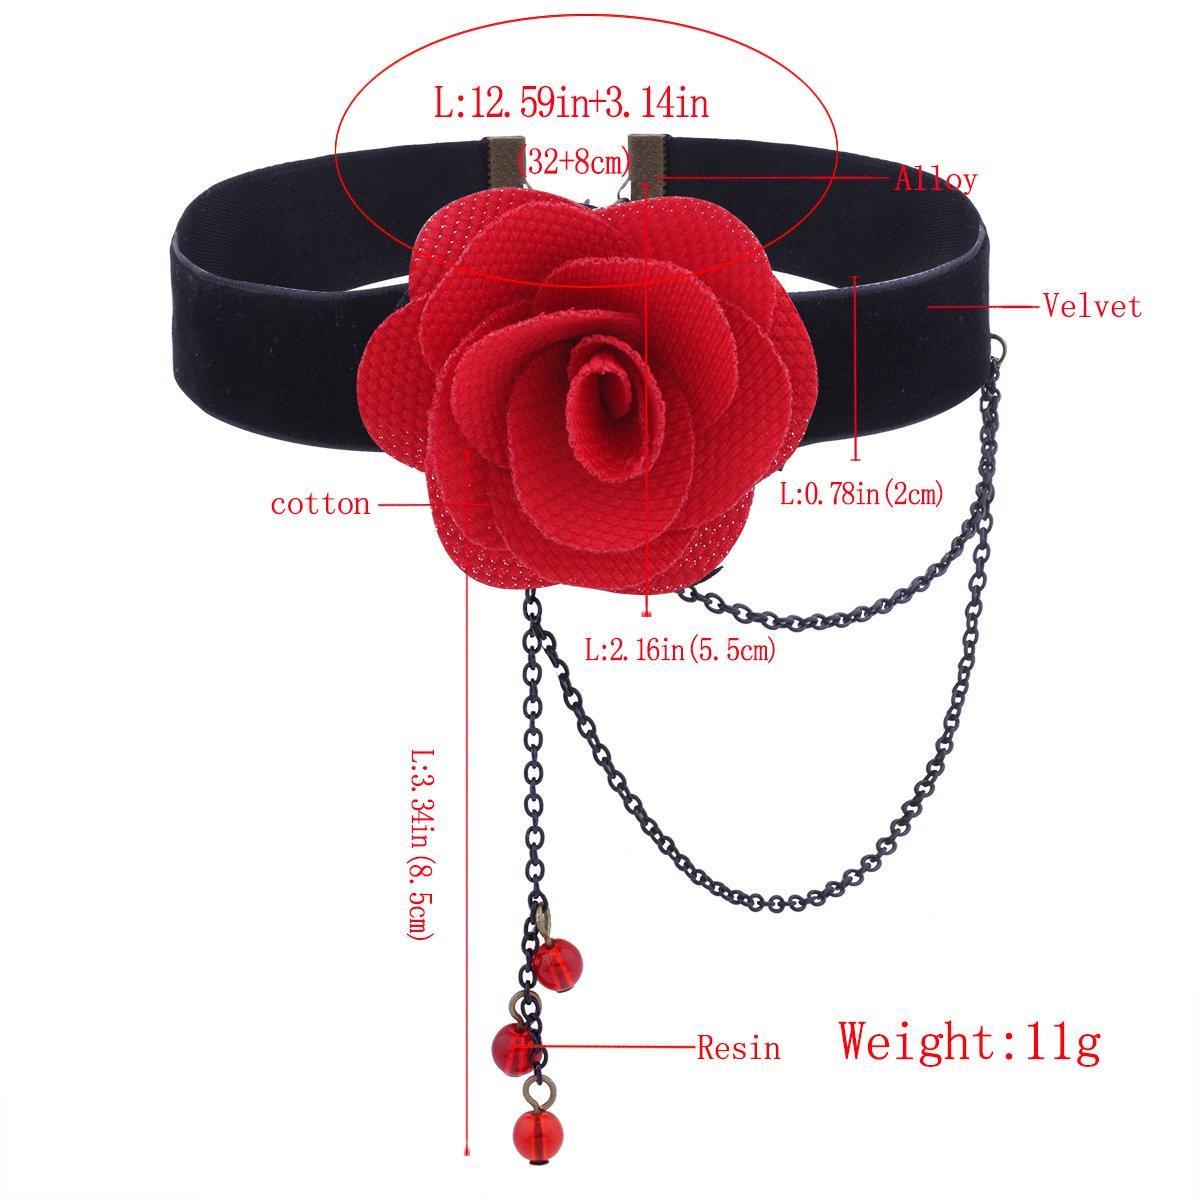 Etgu Lolita Choker Necklace Set-Elegant Vintage Princess Black Lace Gothic Necklace Bracelet Victorian Lolita Choker Pendant Vampire Chain